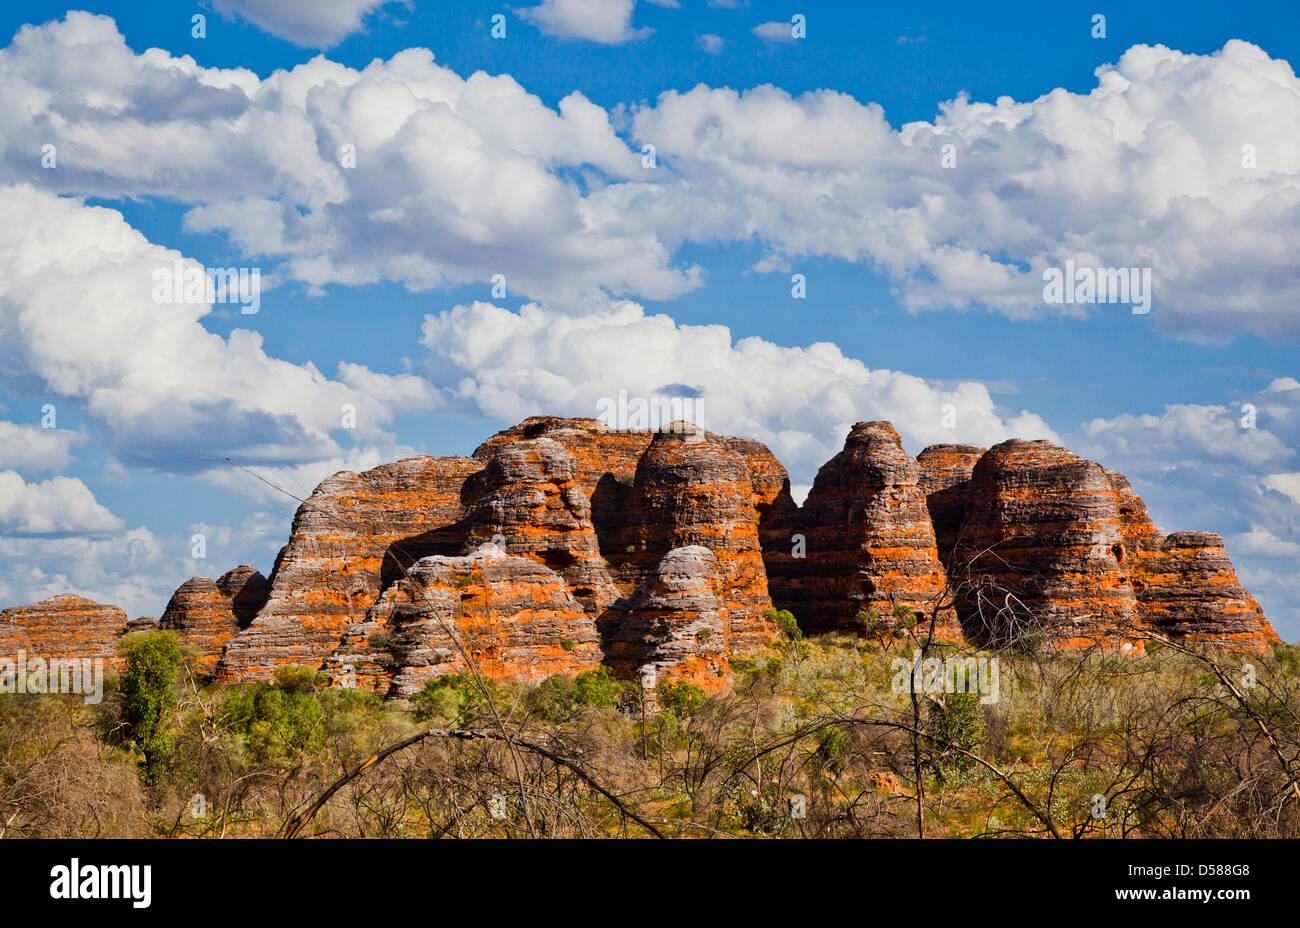 Bungle Bungle National Park, Purnululu, view of the characteristic beehive shaped sandstone domes, Western Australia - Stock Image